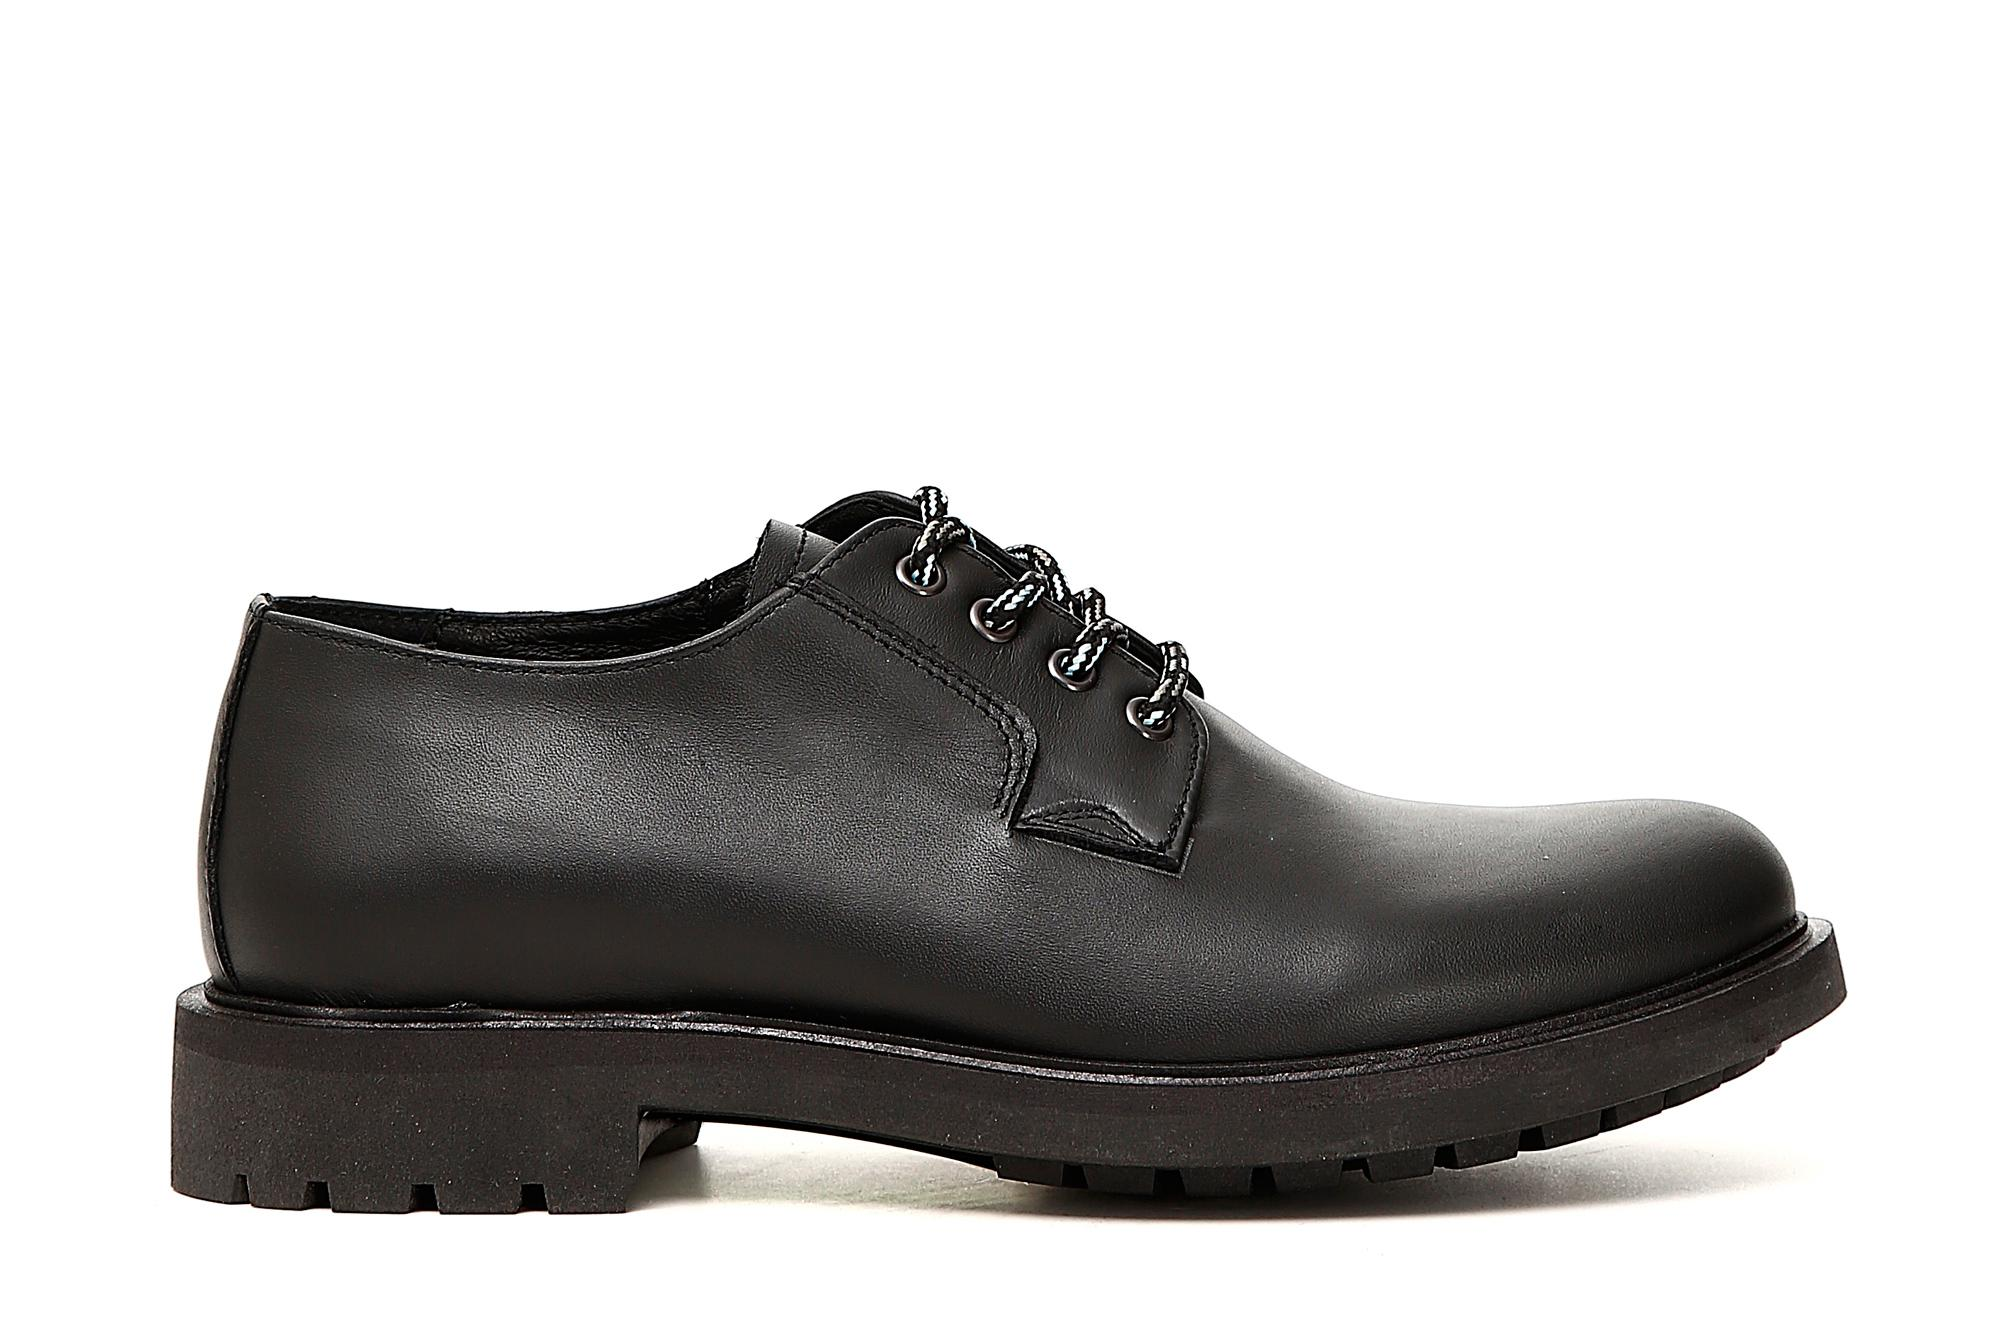 Chaussures Cafè Noir JQC131 DERBY EN EN EN CALF ba1daf